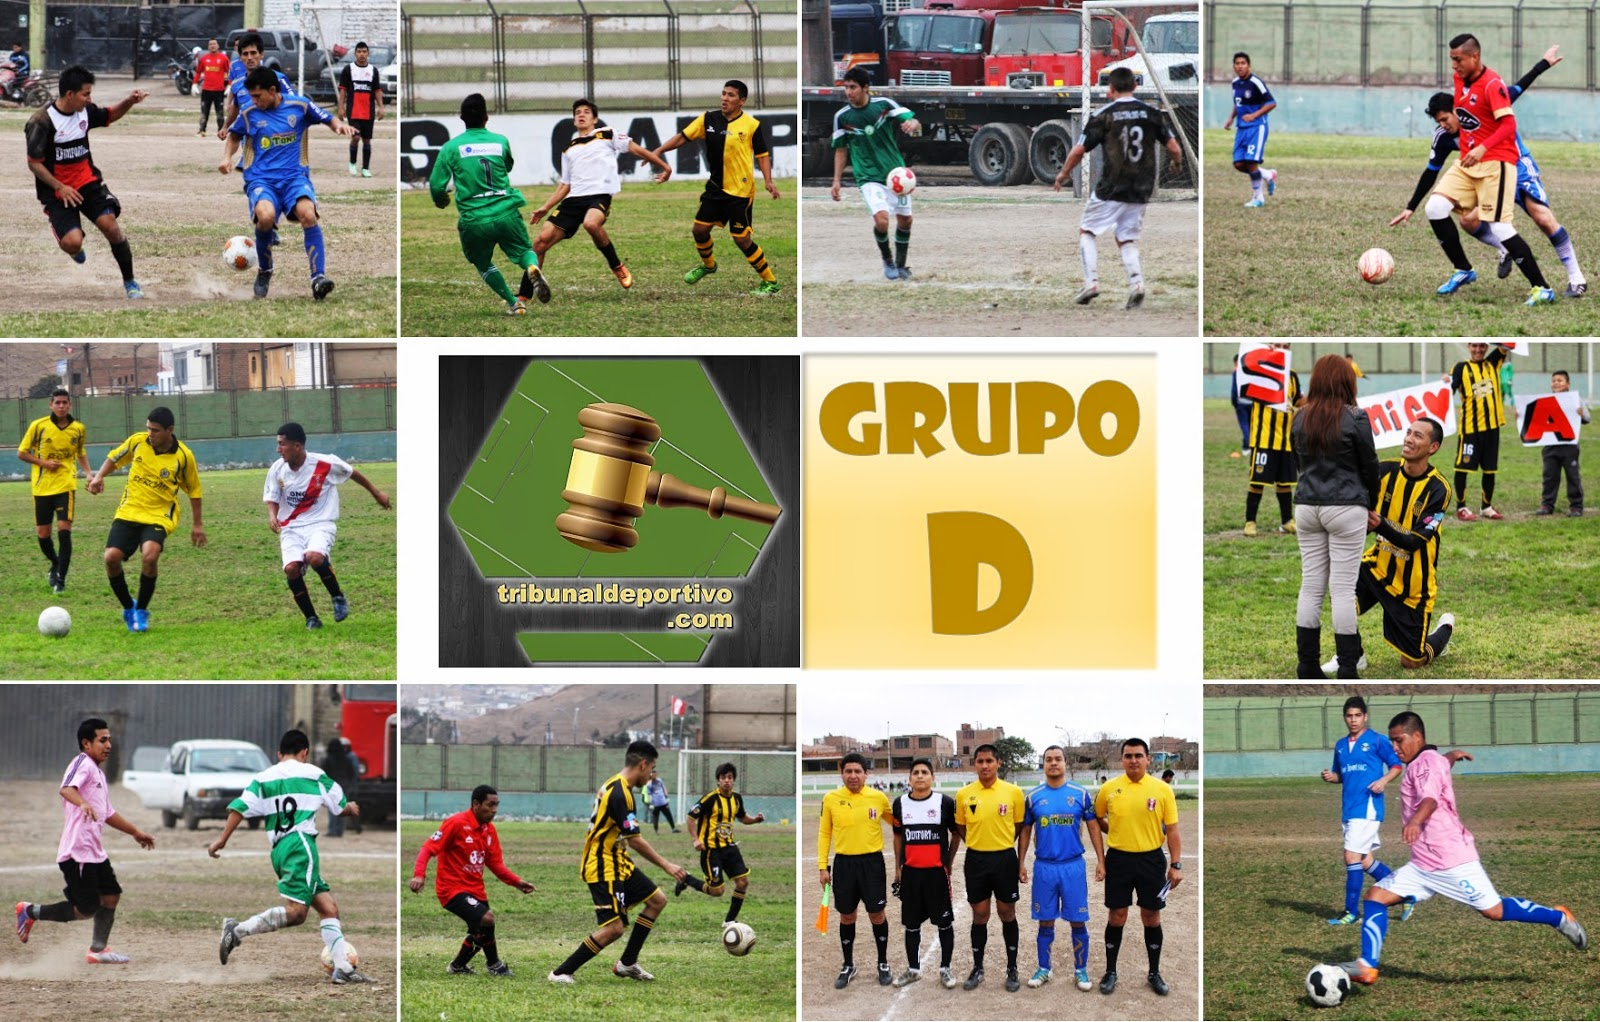 http://tribunal-deportivo.blogspot.com/2014/09/departamental-callao-1-fase-grupo-d.html